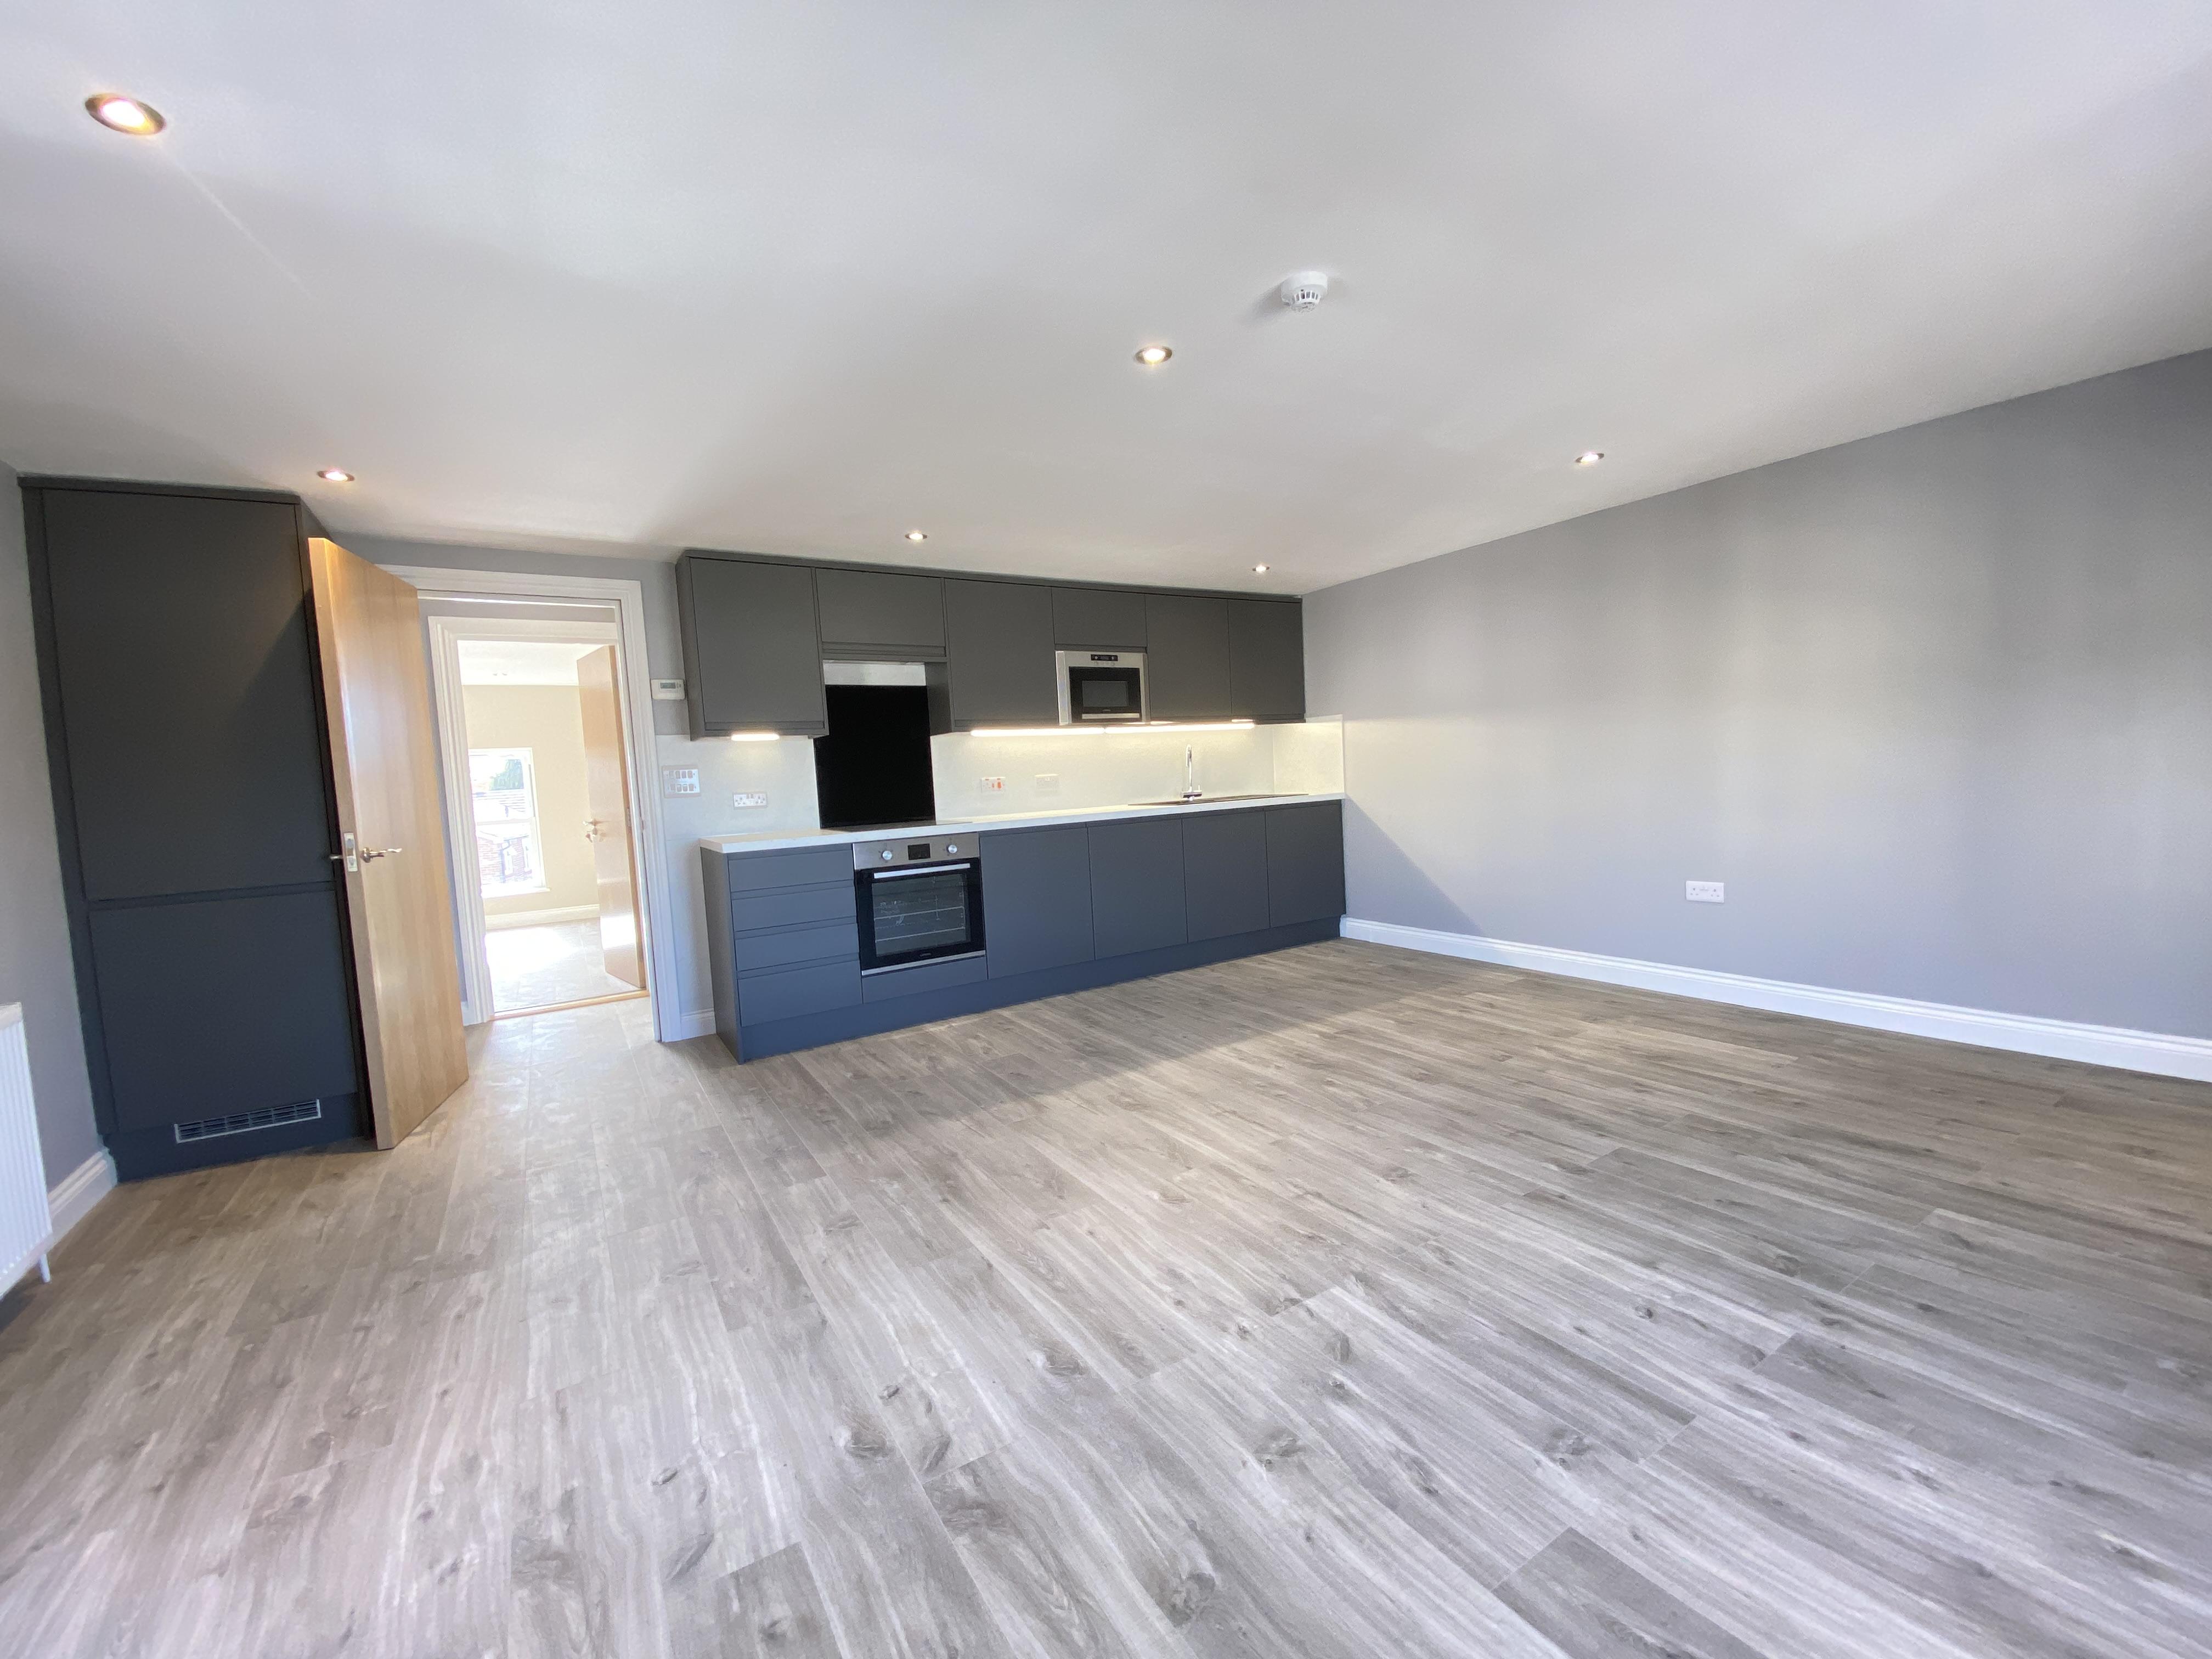 2 bed flat to rent in Pier Road, Gravesend, DA11